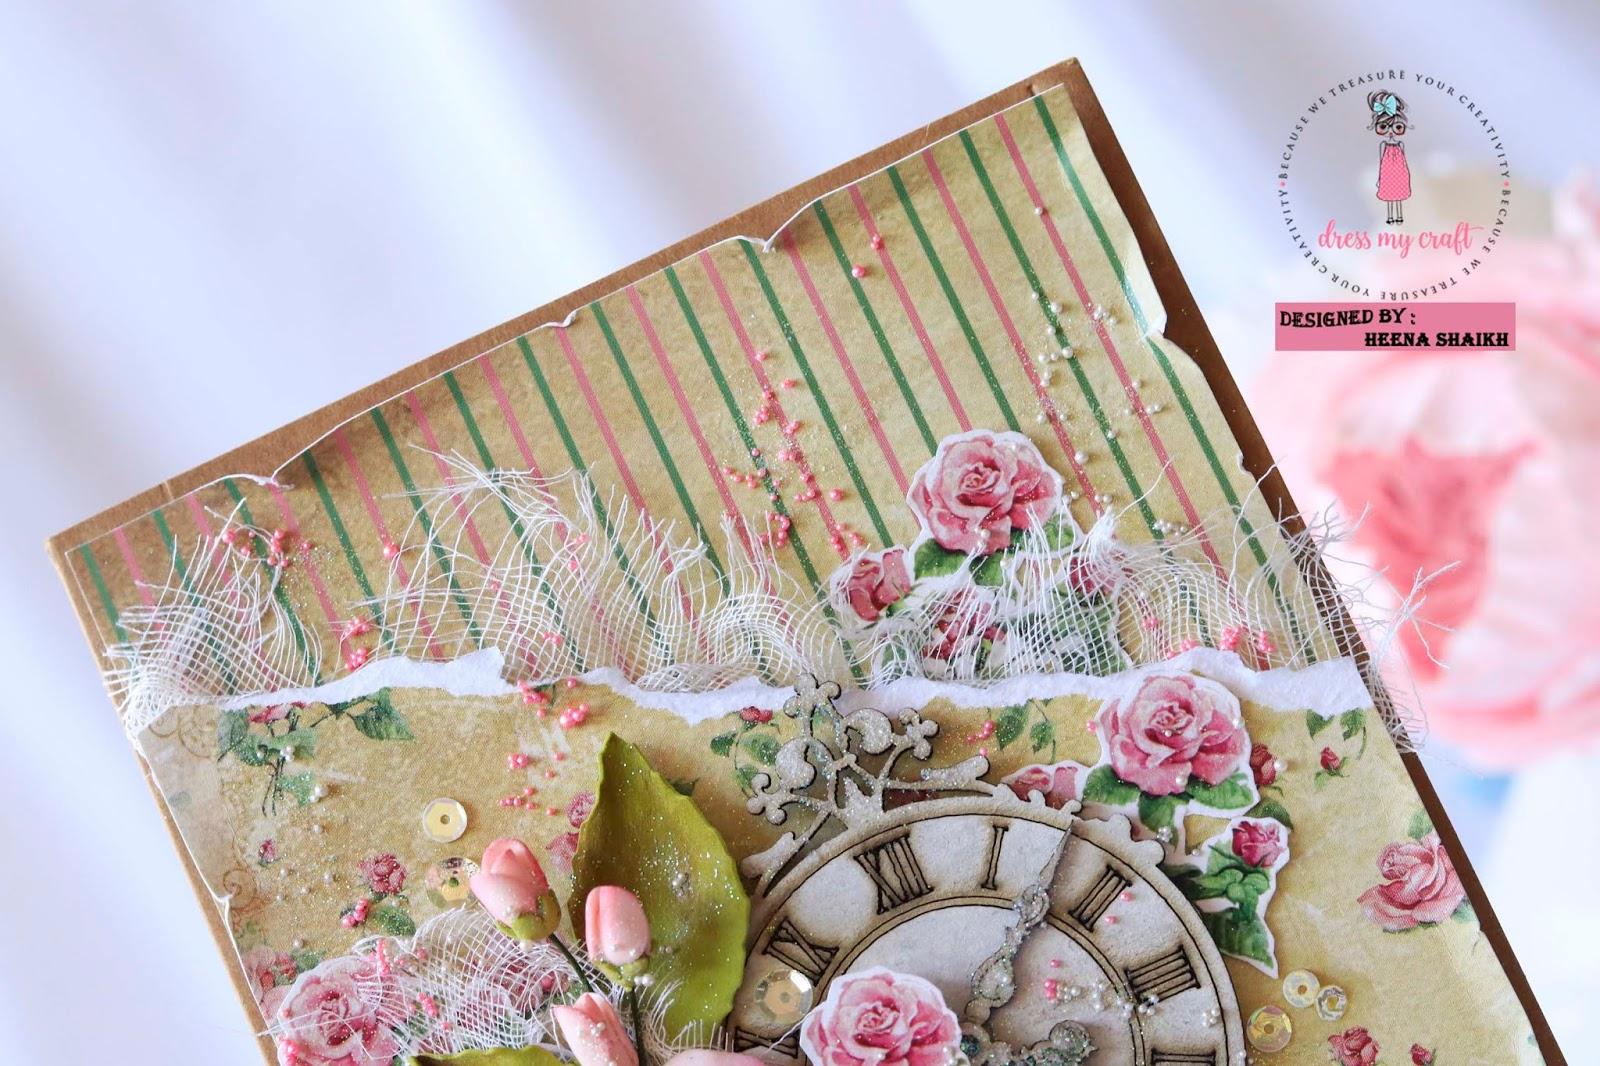 Dress My Craft: Vintage Cards with Teenie Weenie Papers and